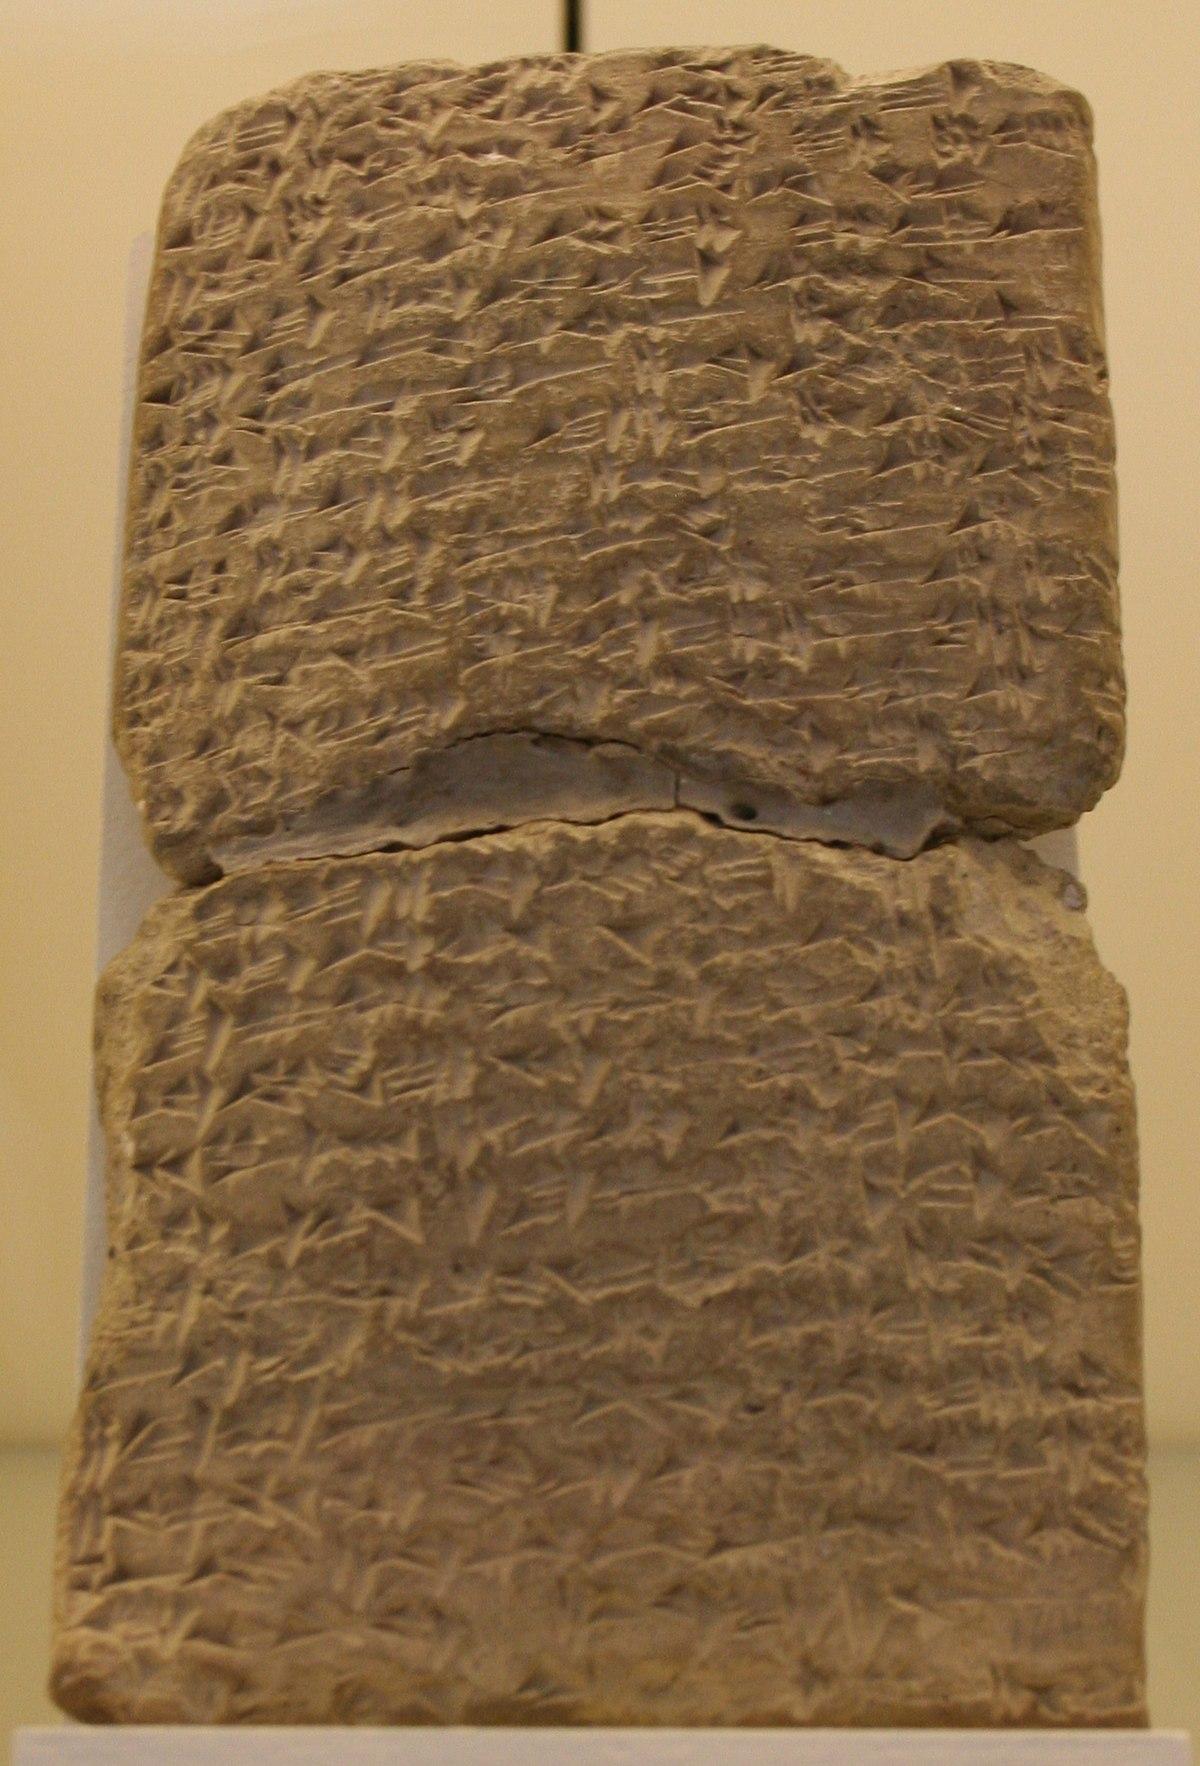 diš cuneiform wikipedia